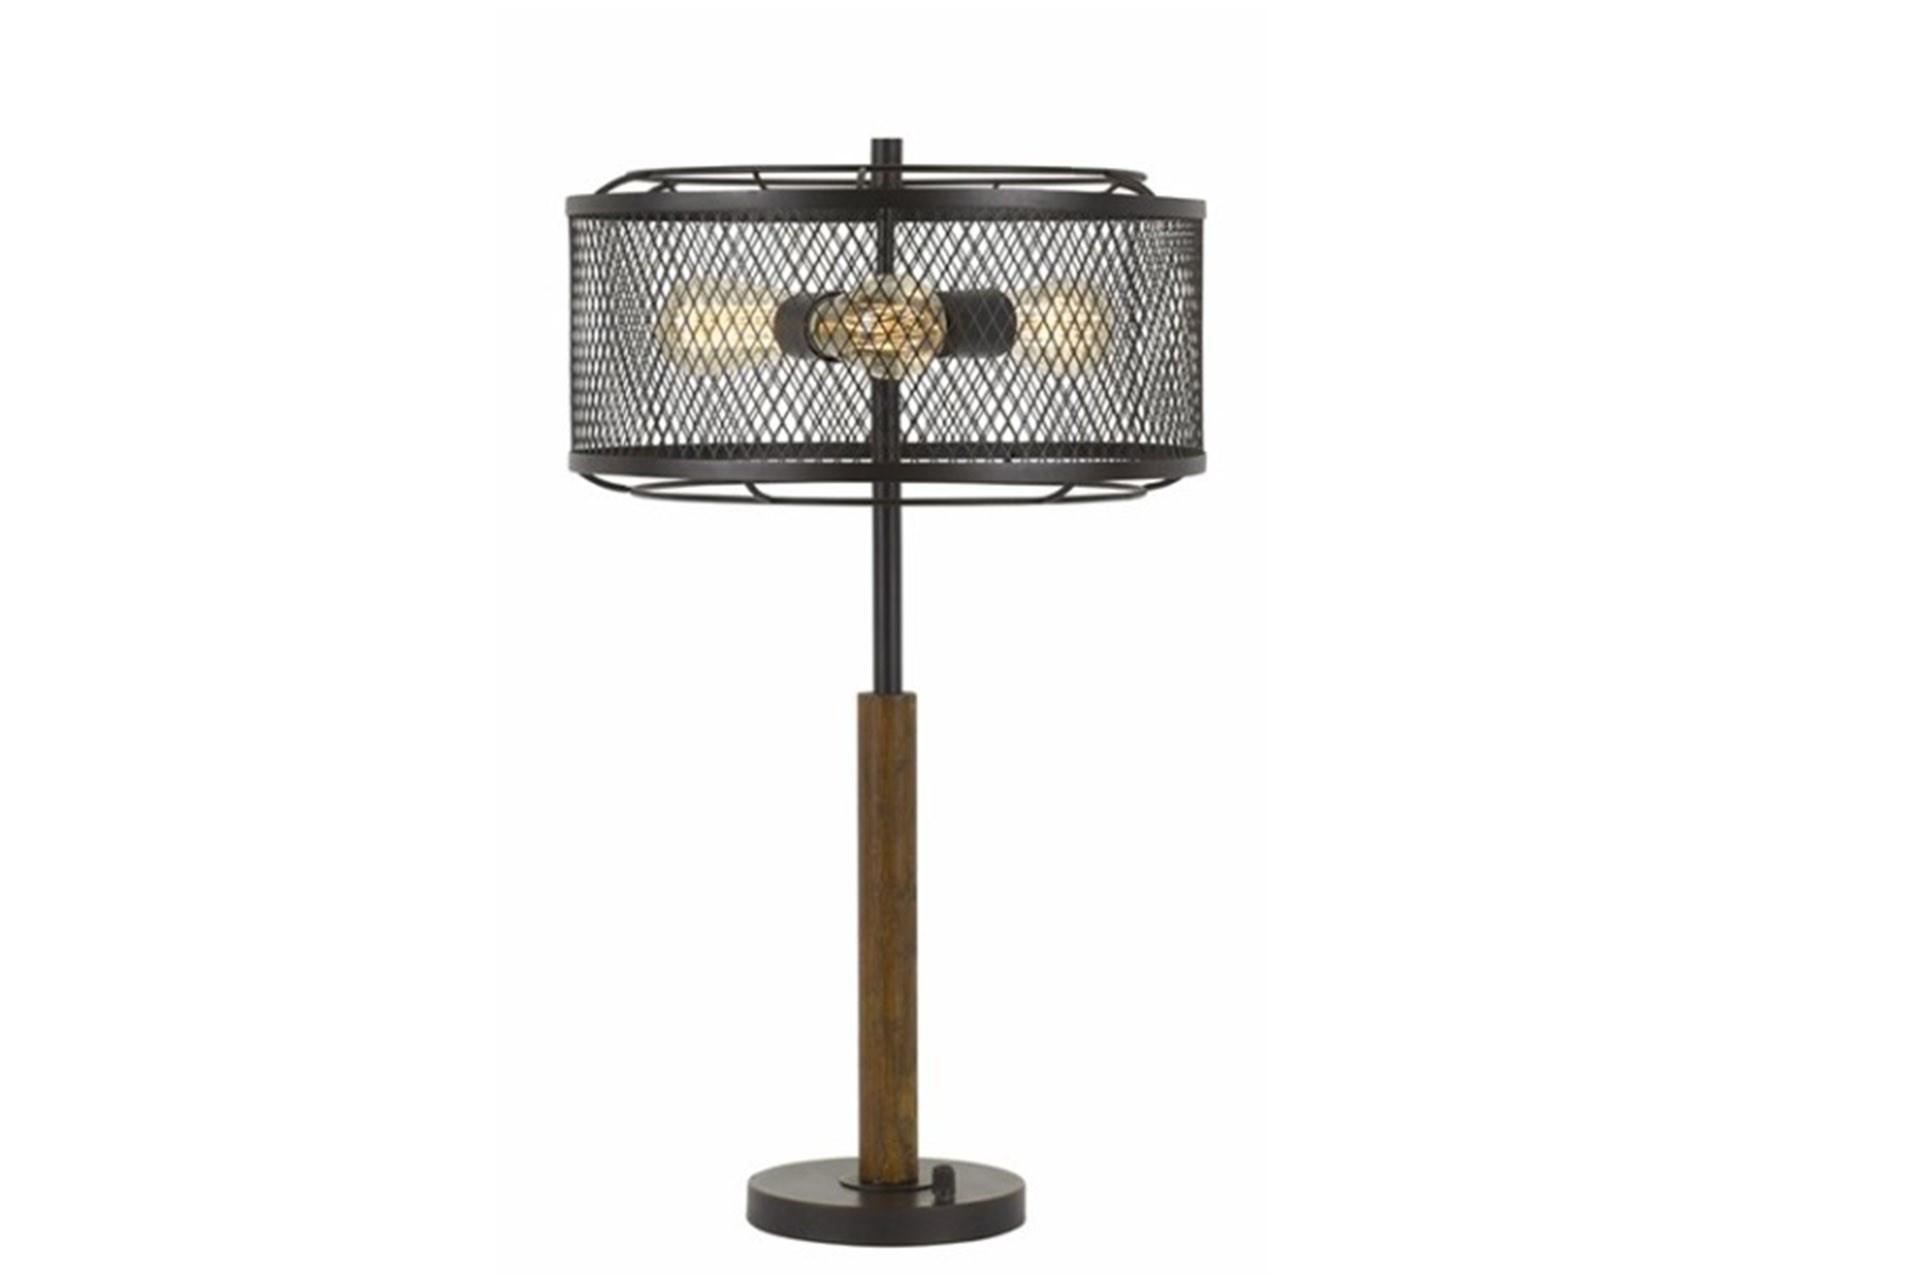 Table Lamp Mesh Metal And Wood